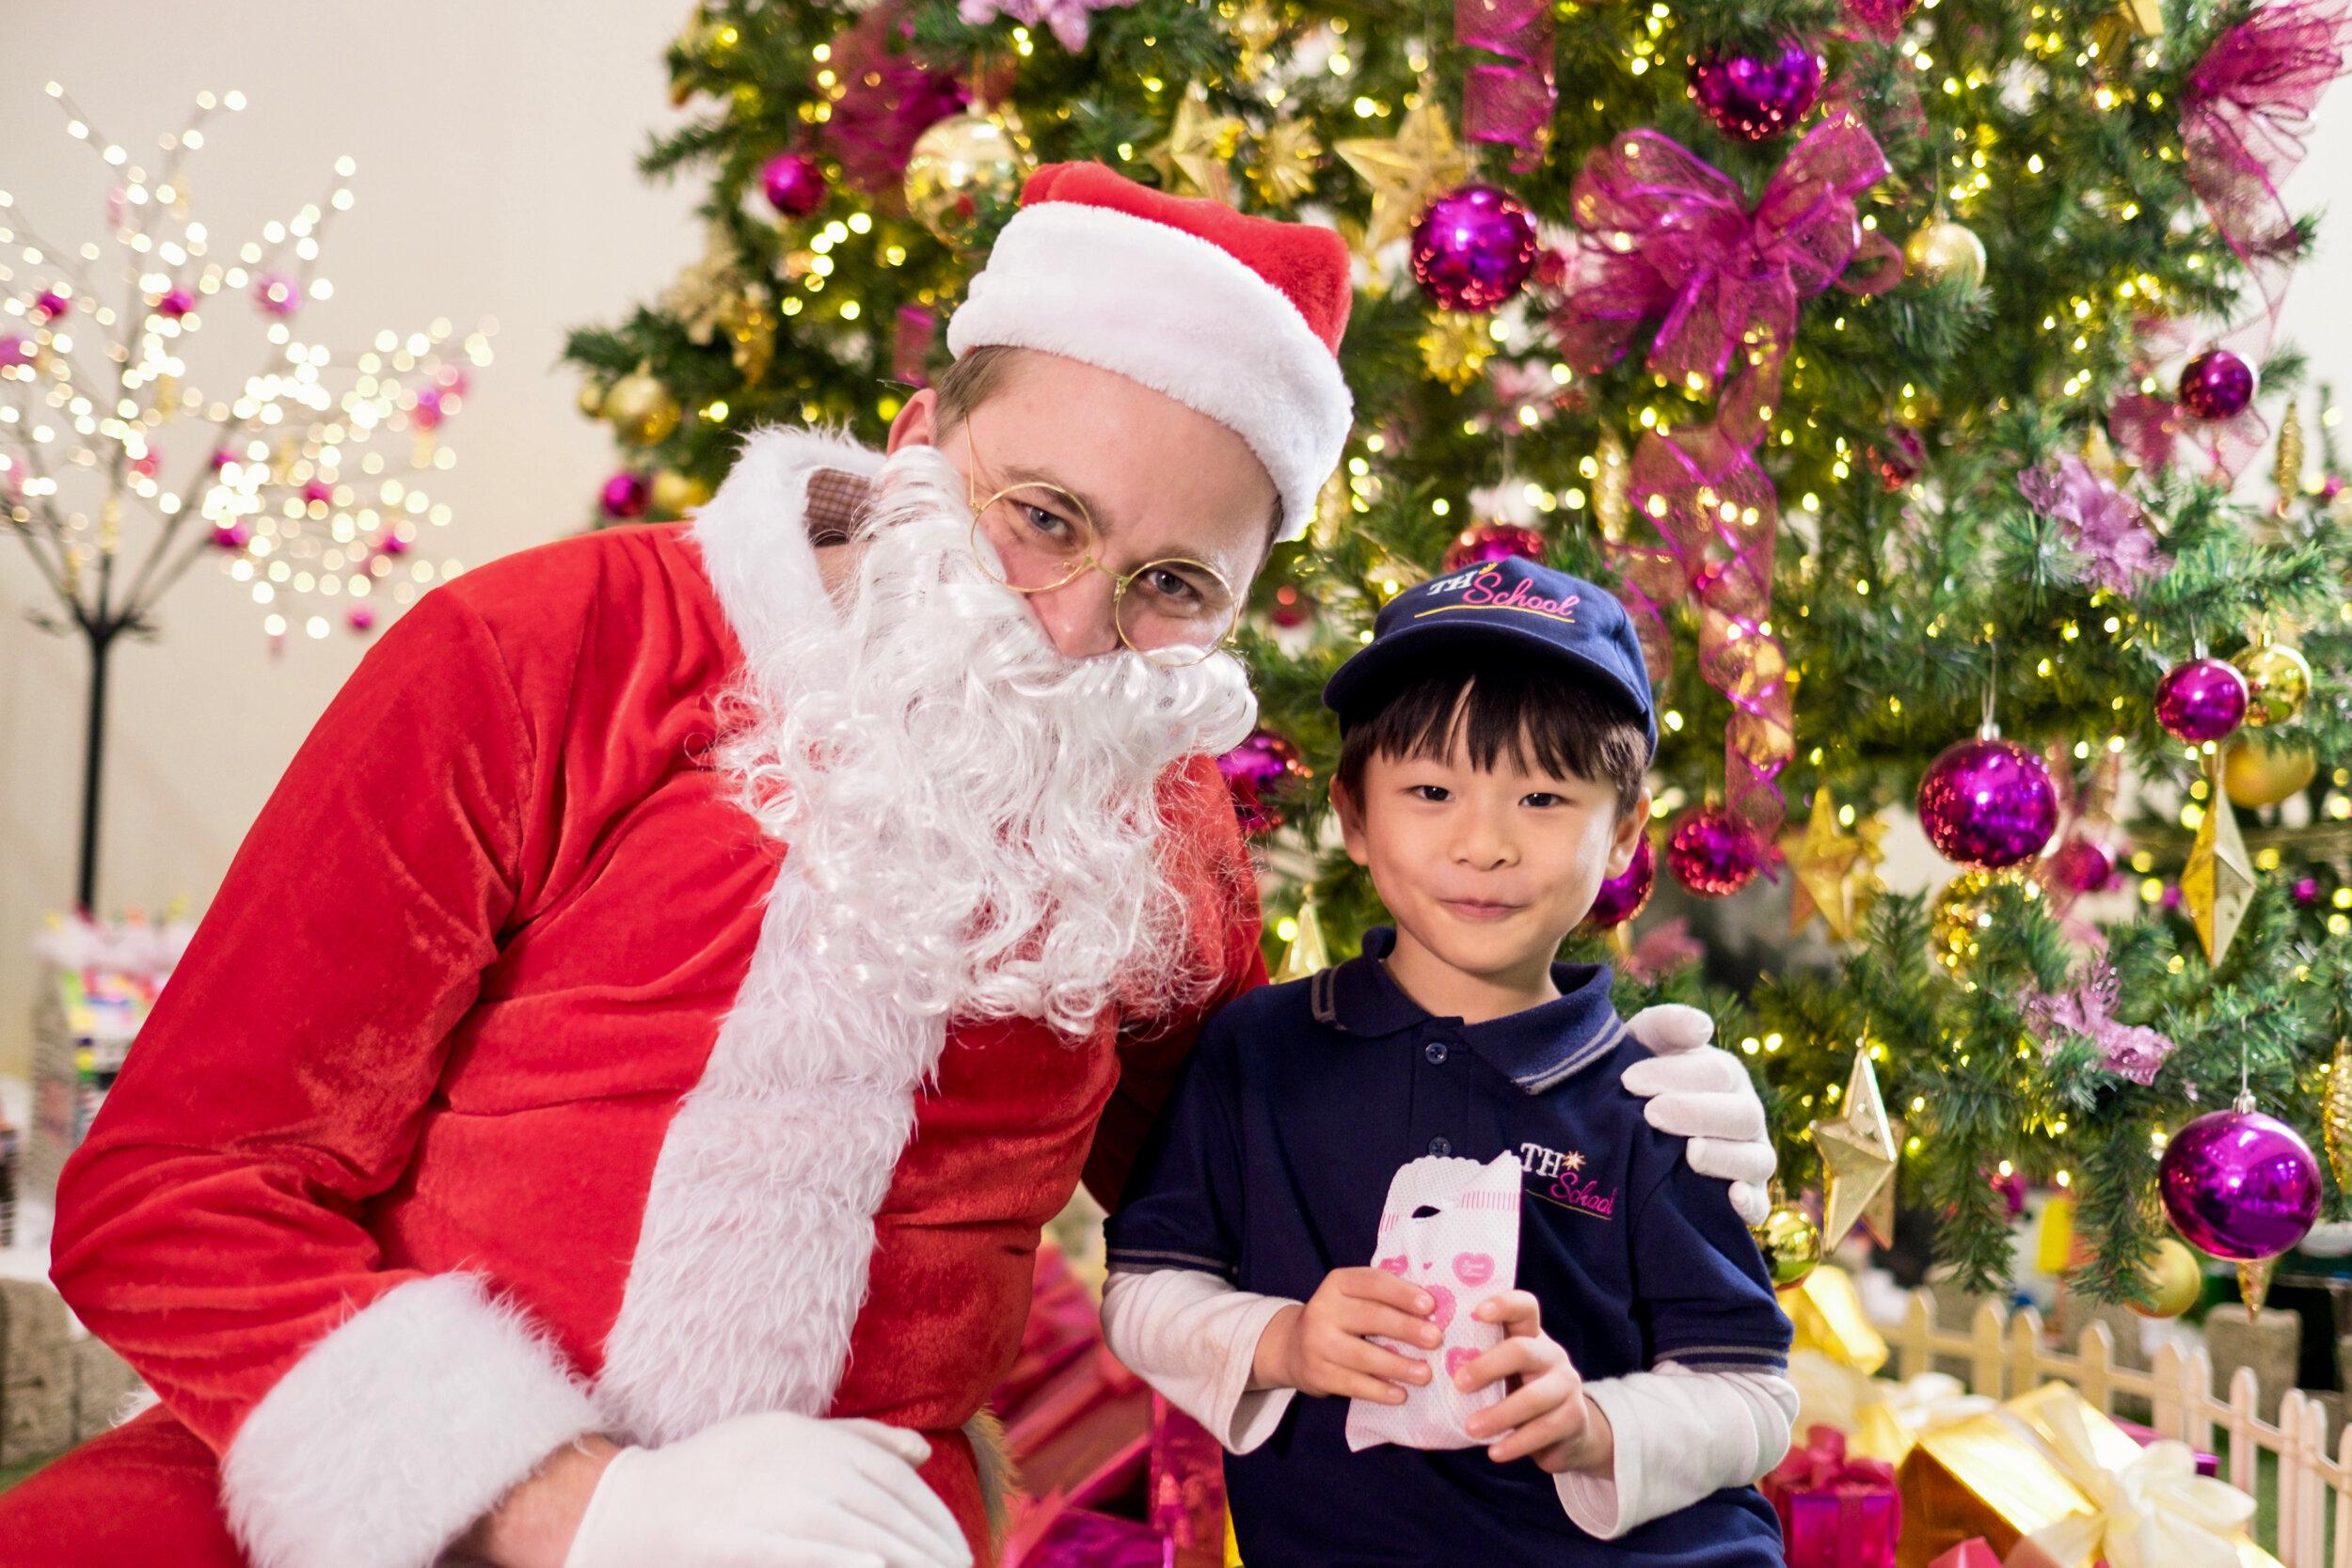 Photoshoot with Santa Clause-767.jpg